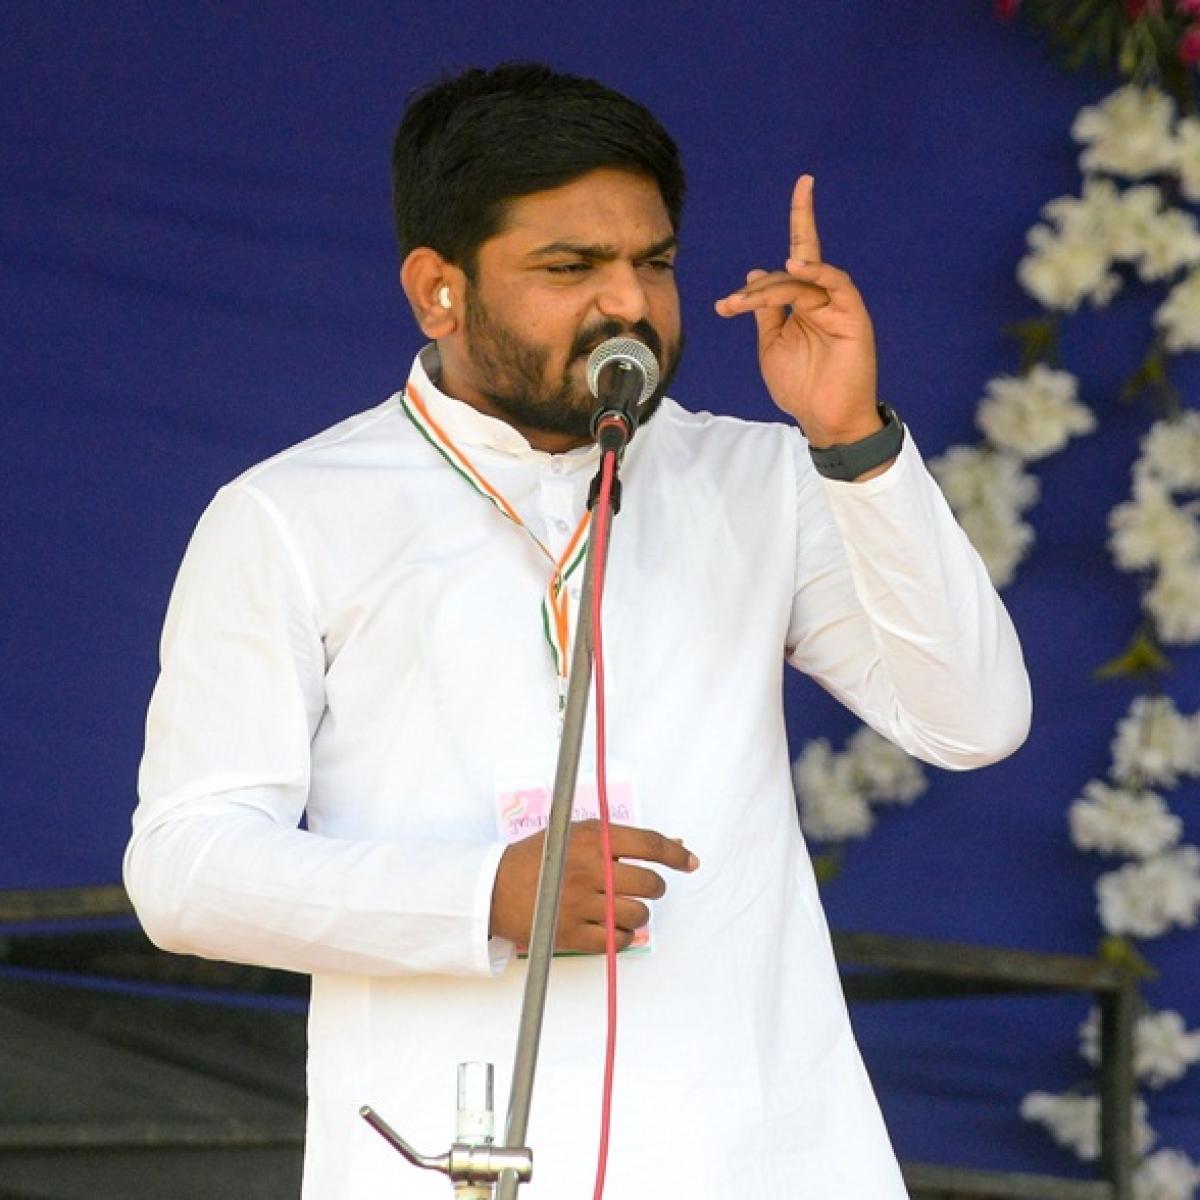 'Baseless': Gujarat Congress leader Hardik Patel rubbishes 'fake reports' of him joining AAP